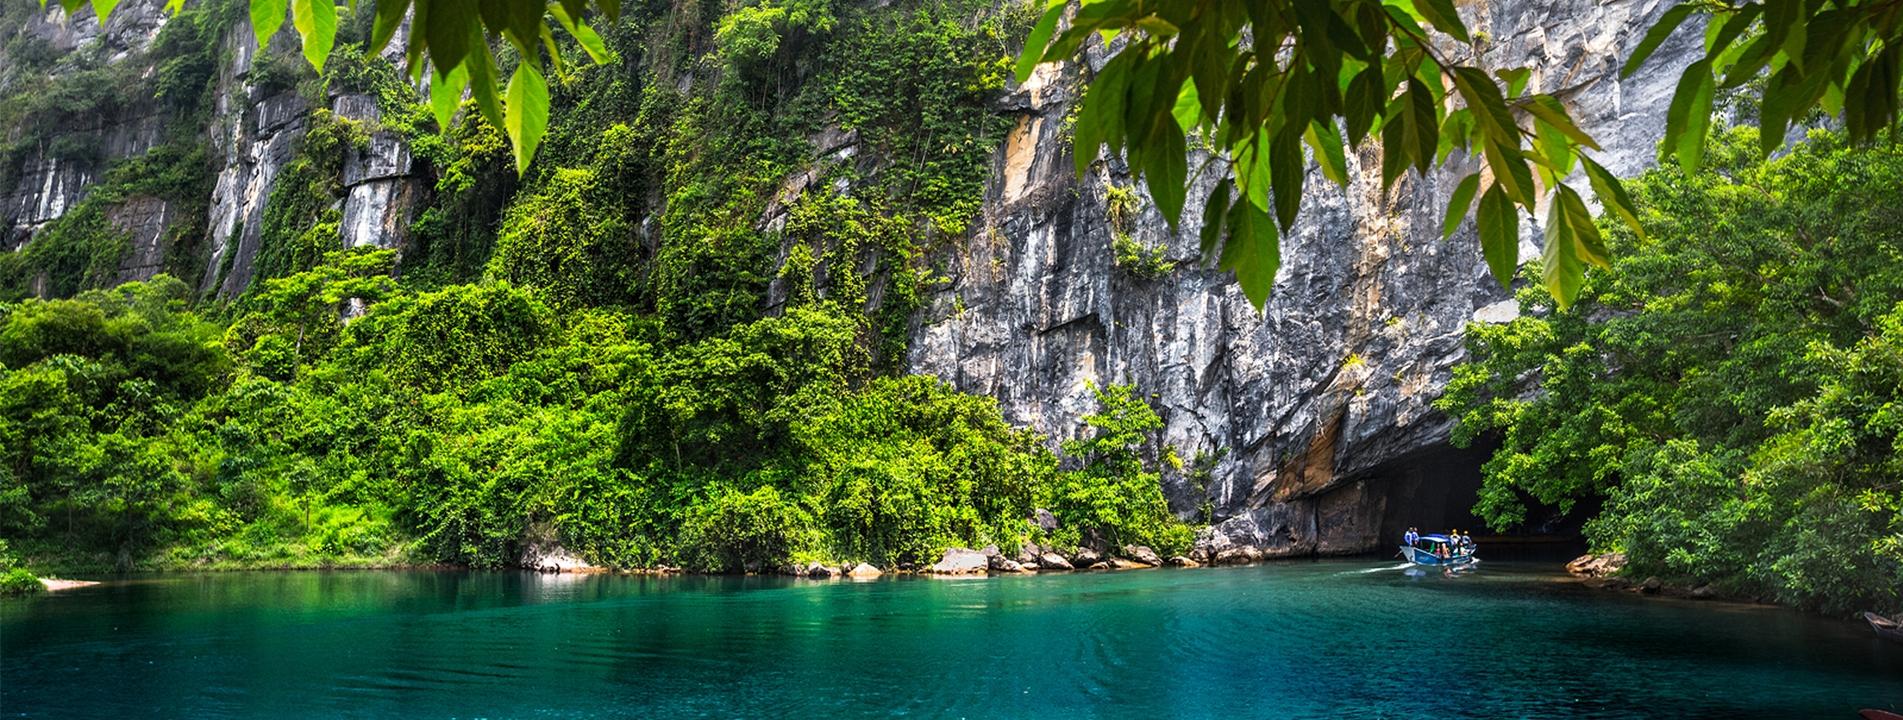 5-Day Central Vietnam Culture Exploration